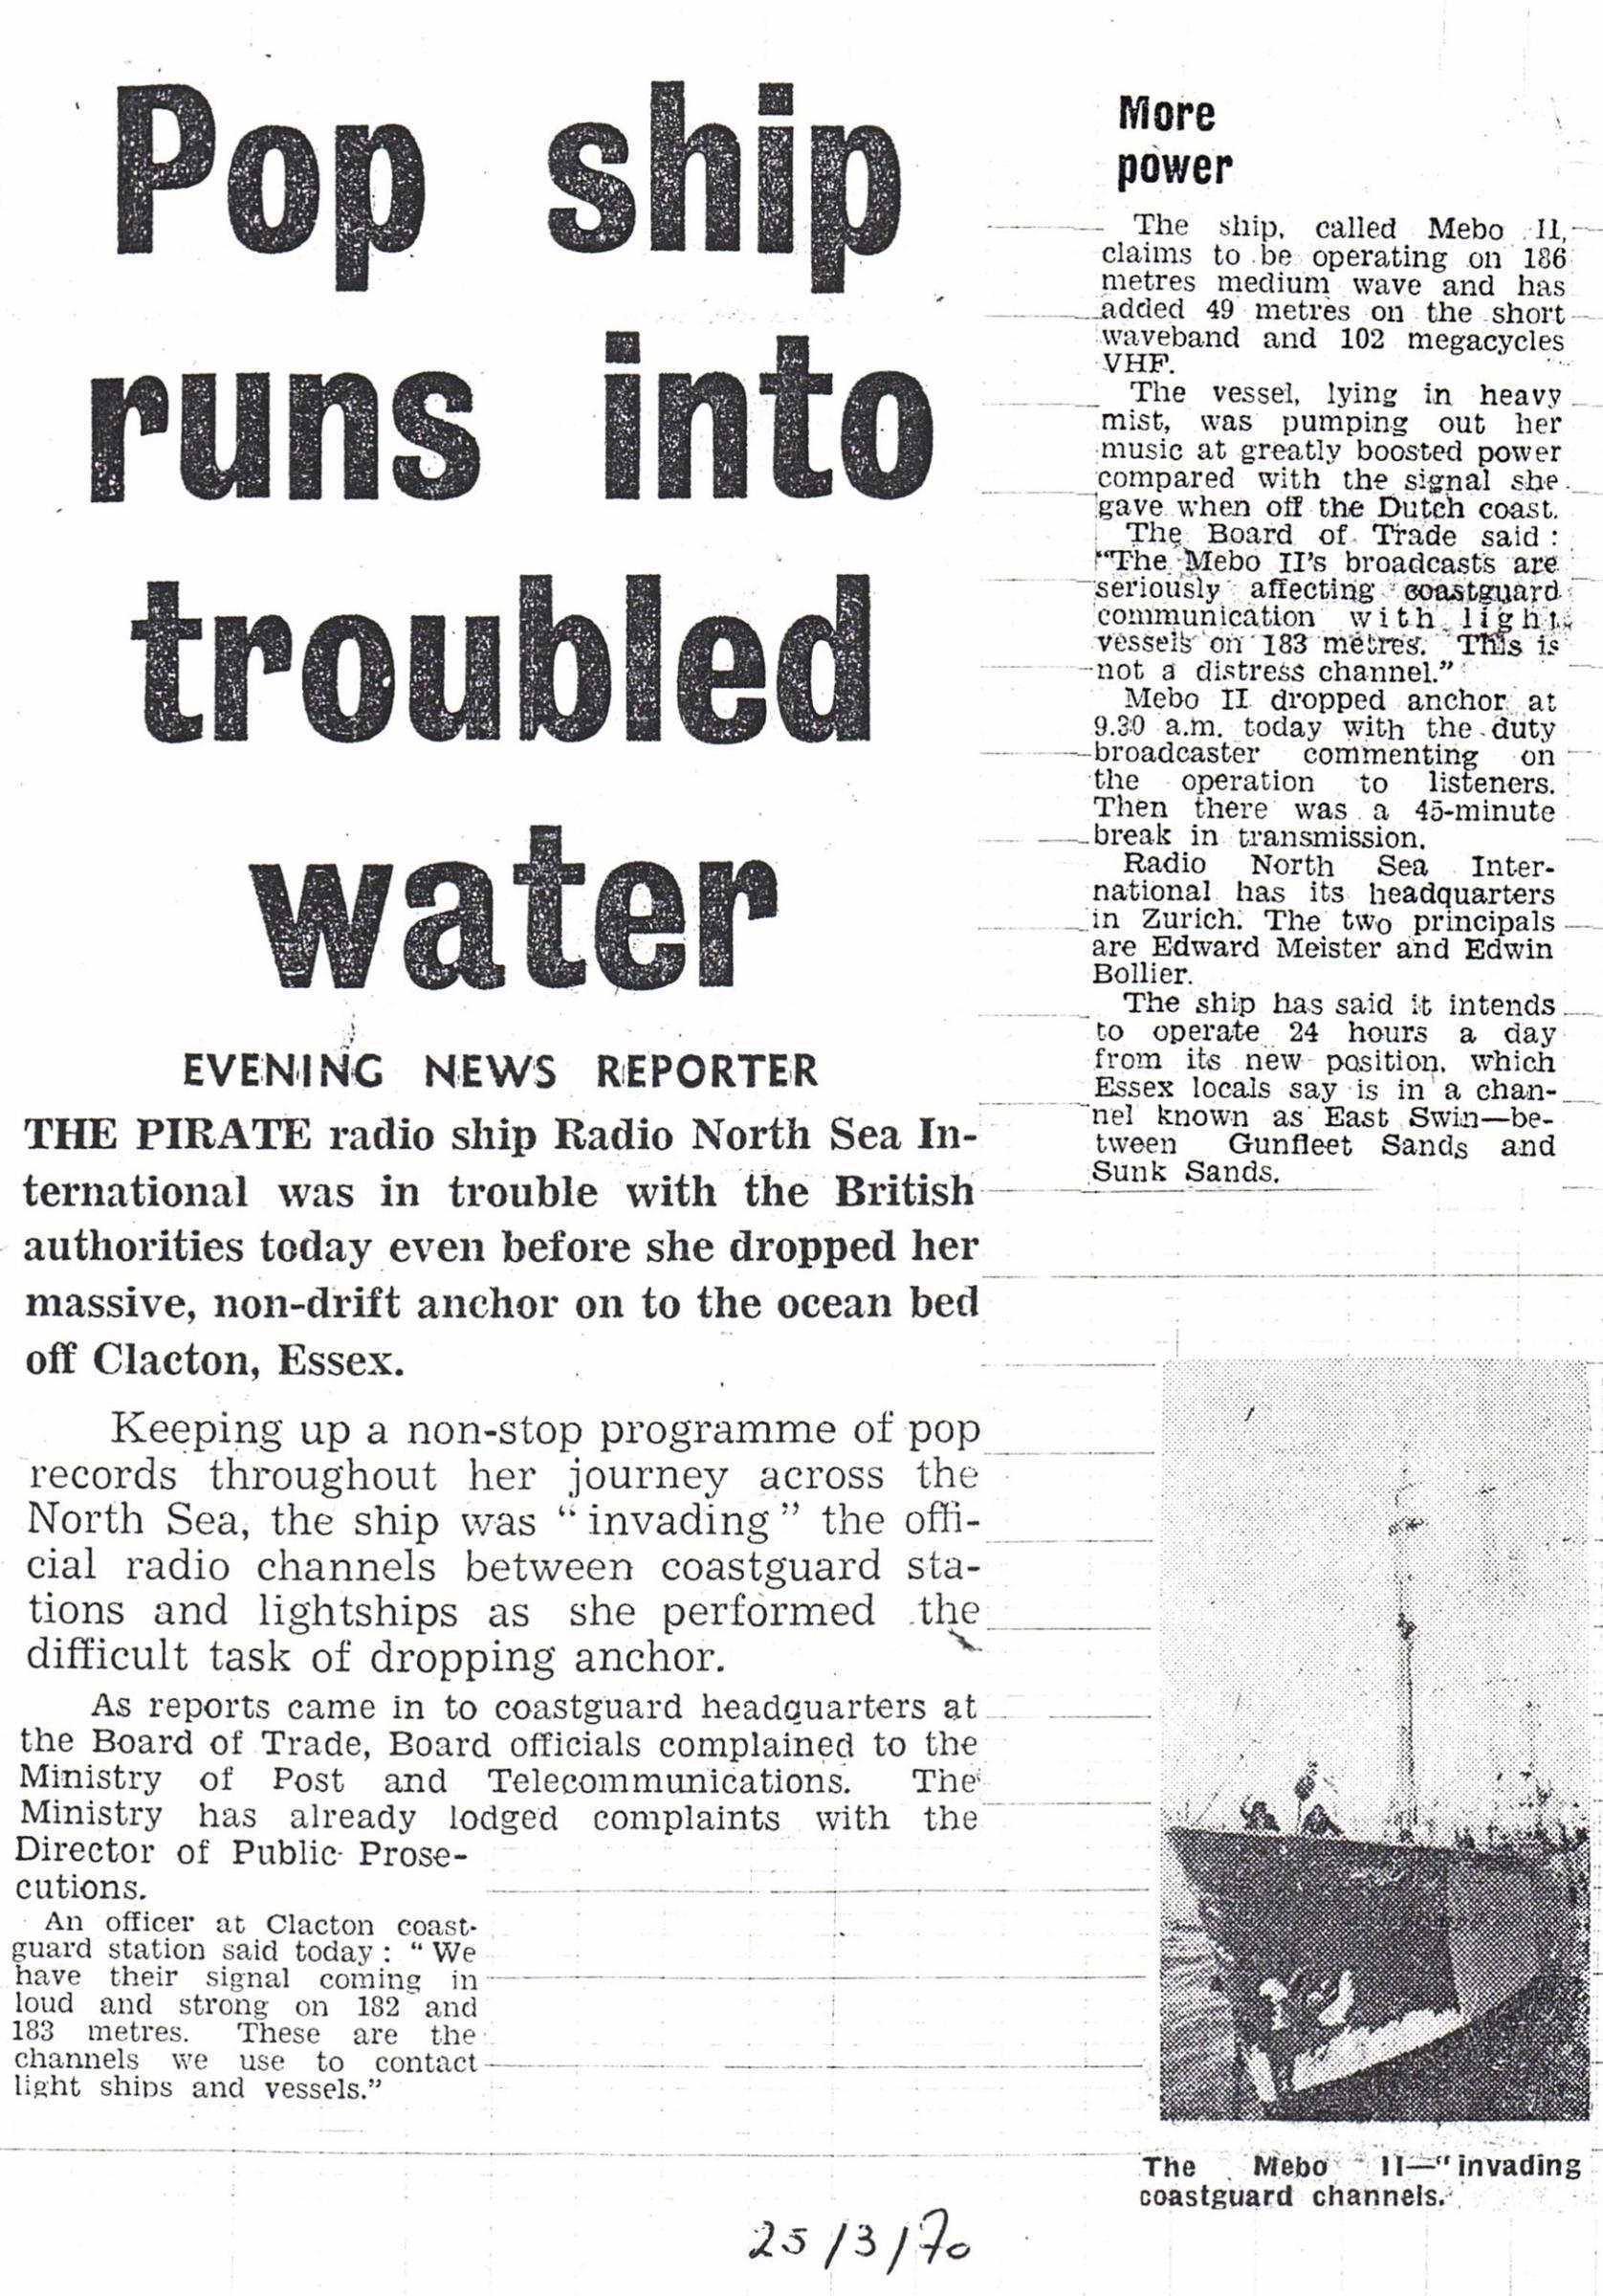 19700325 Evening News Pop ship runs into troubled water 01.jpg